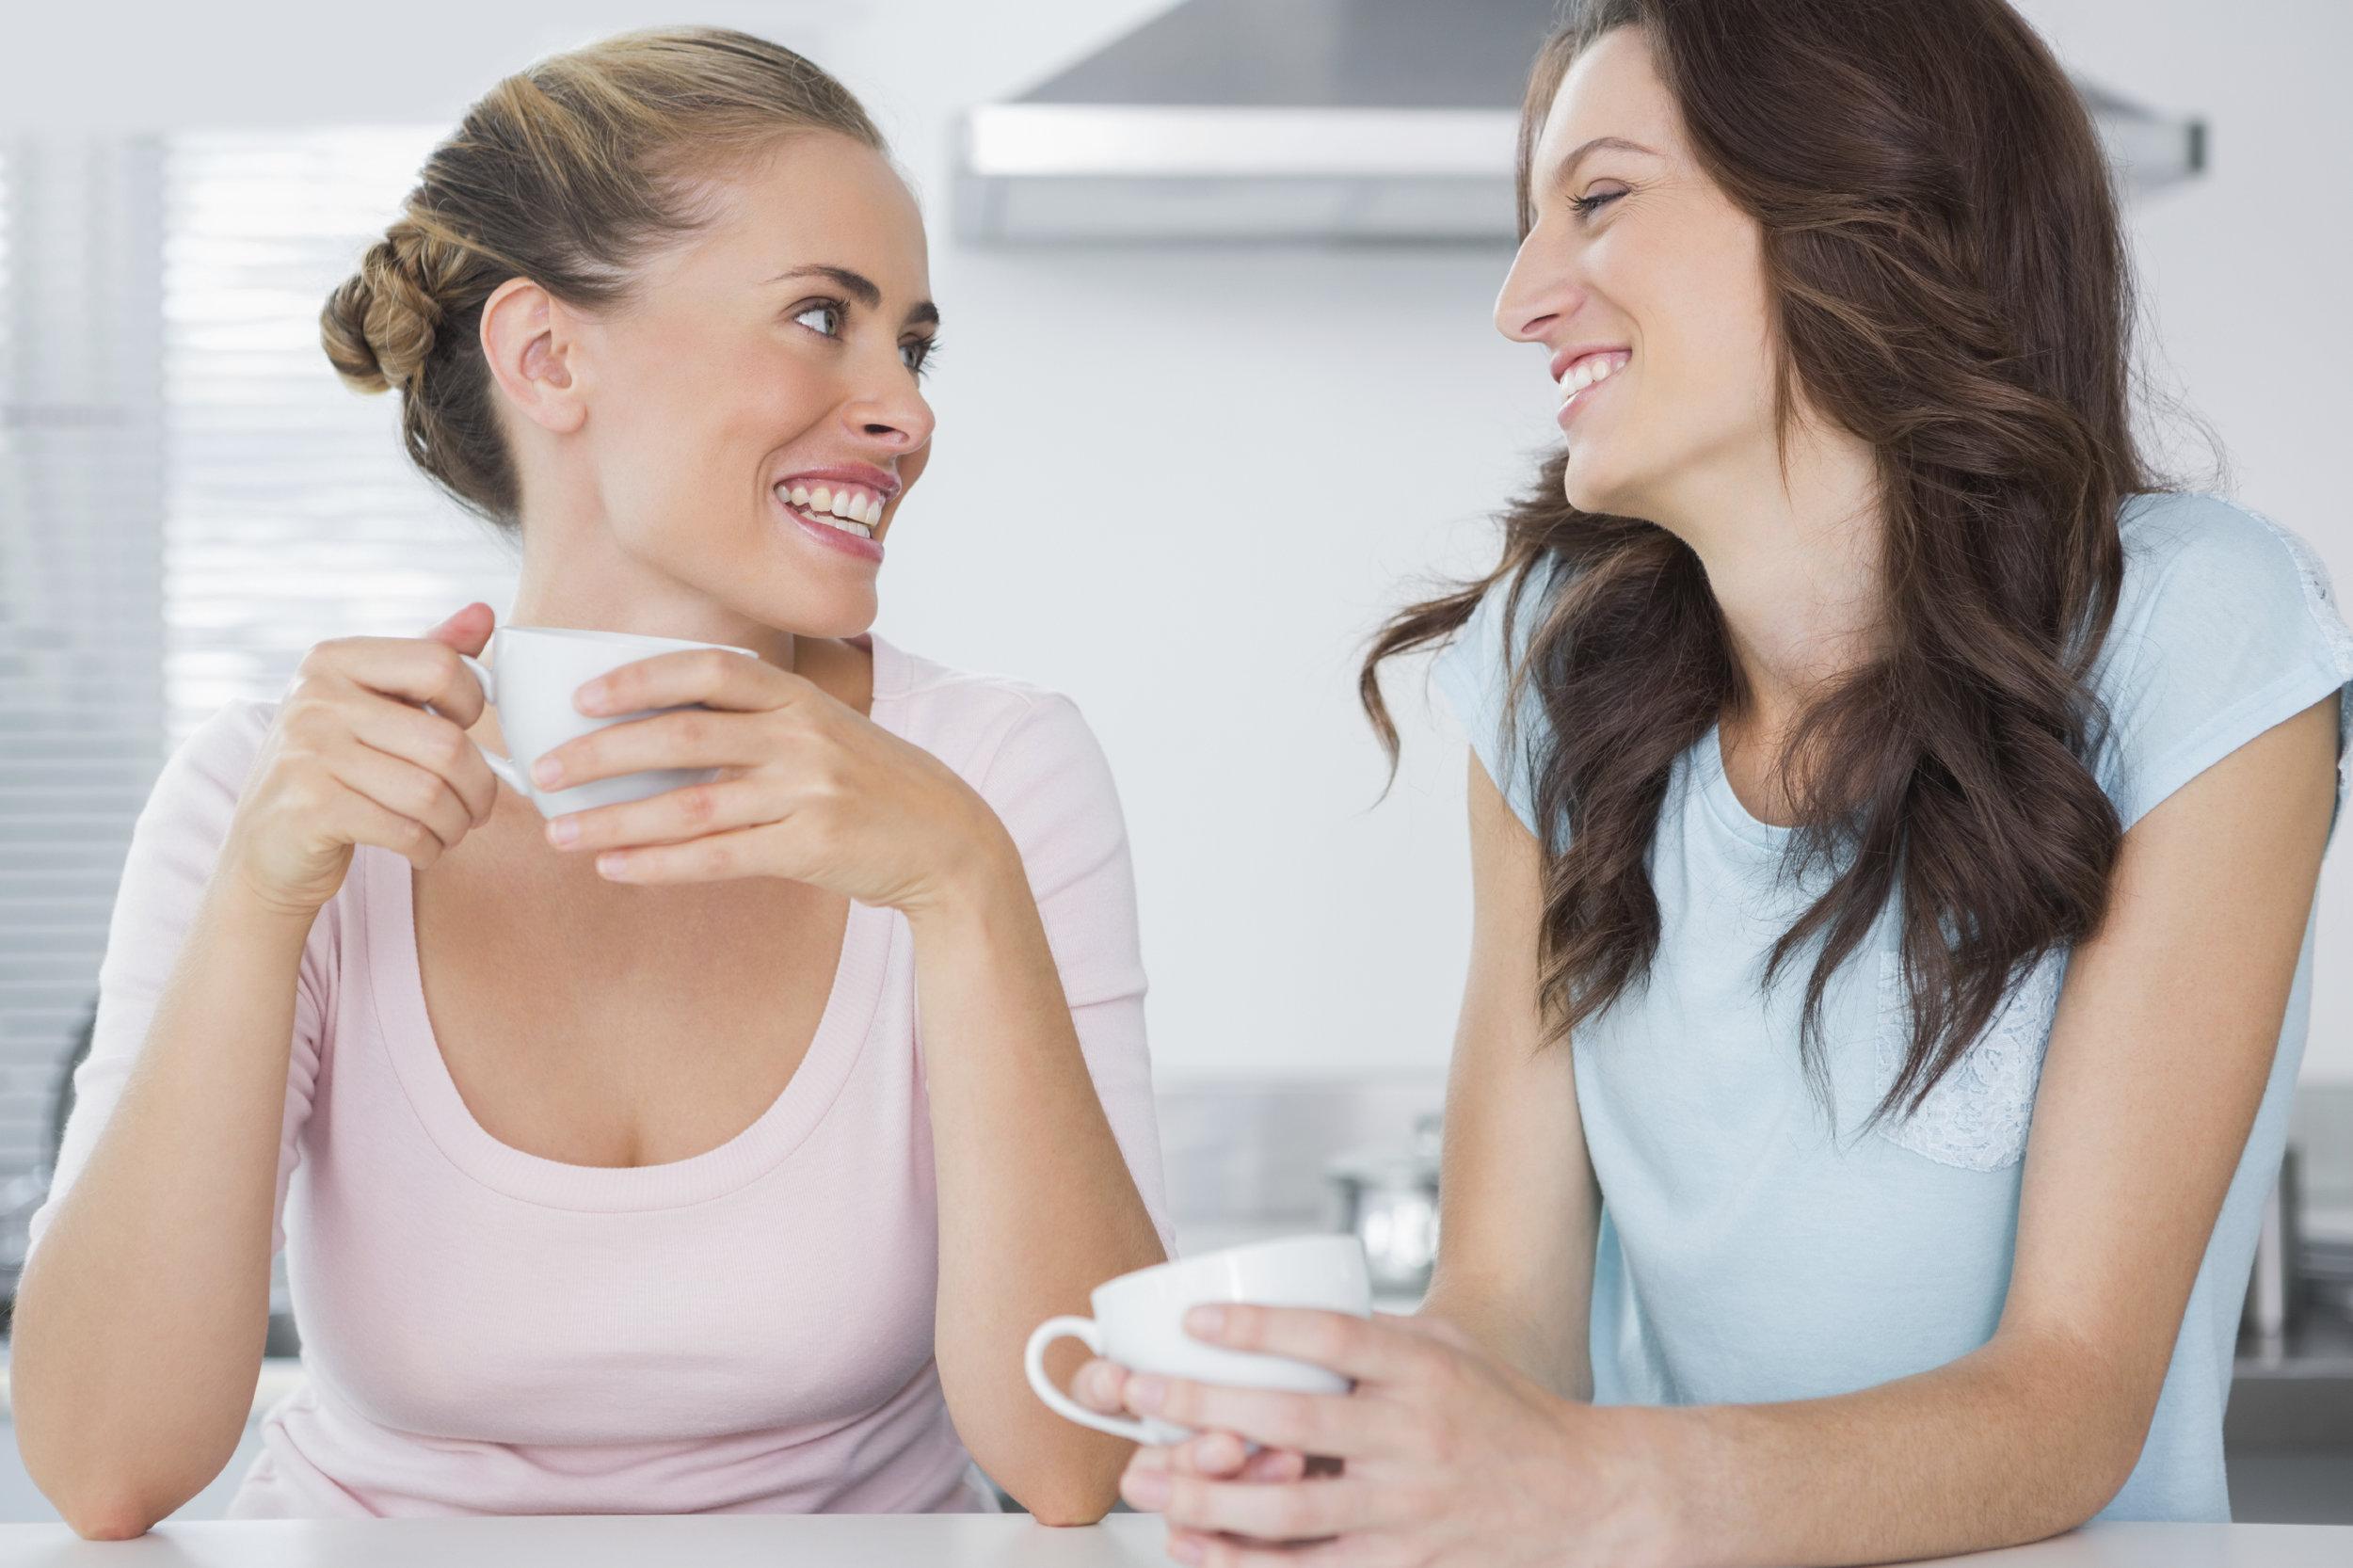 Woman talking for refer a friend.jpg